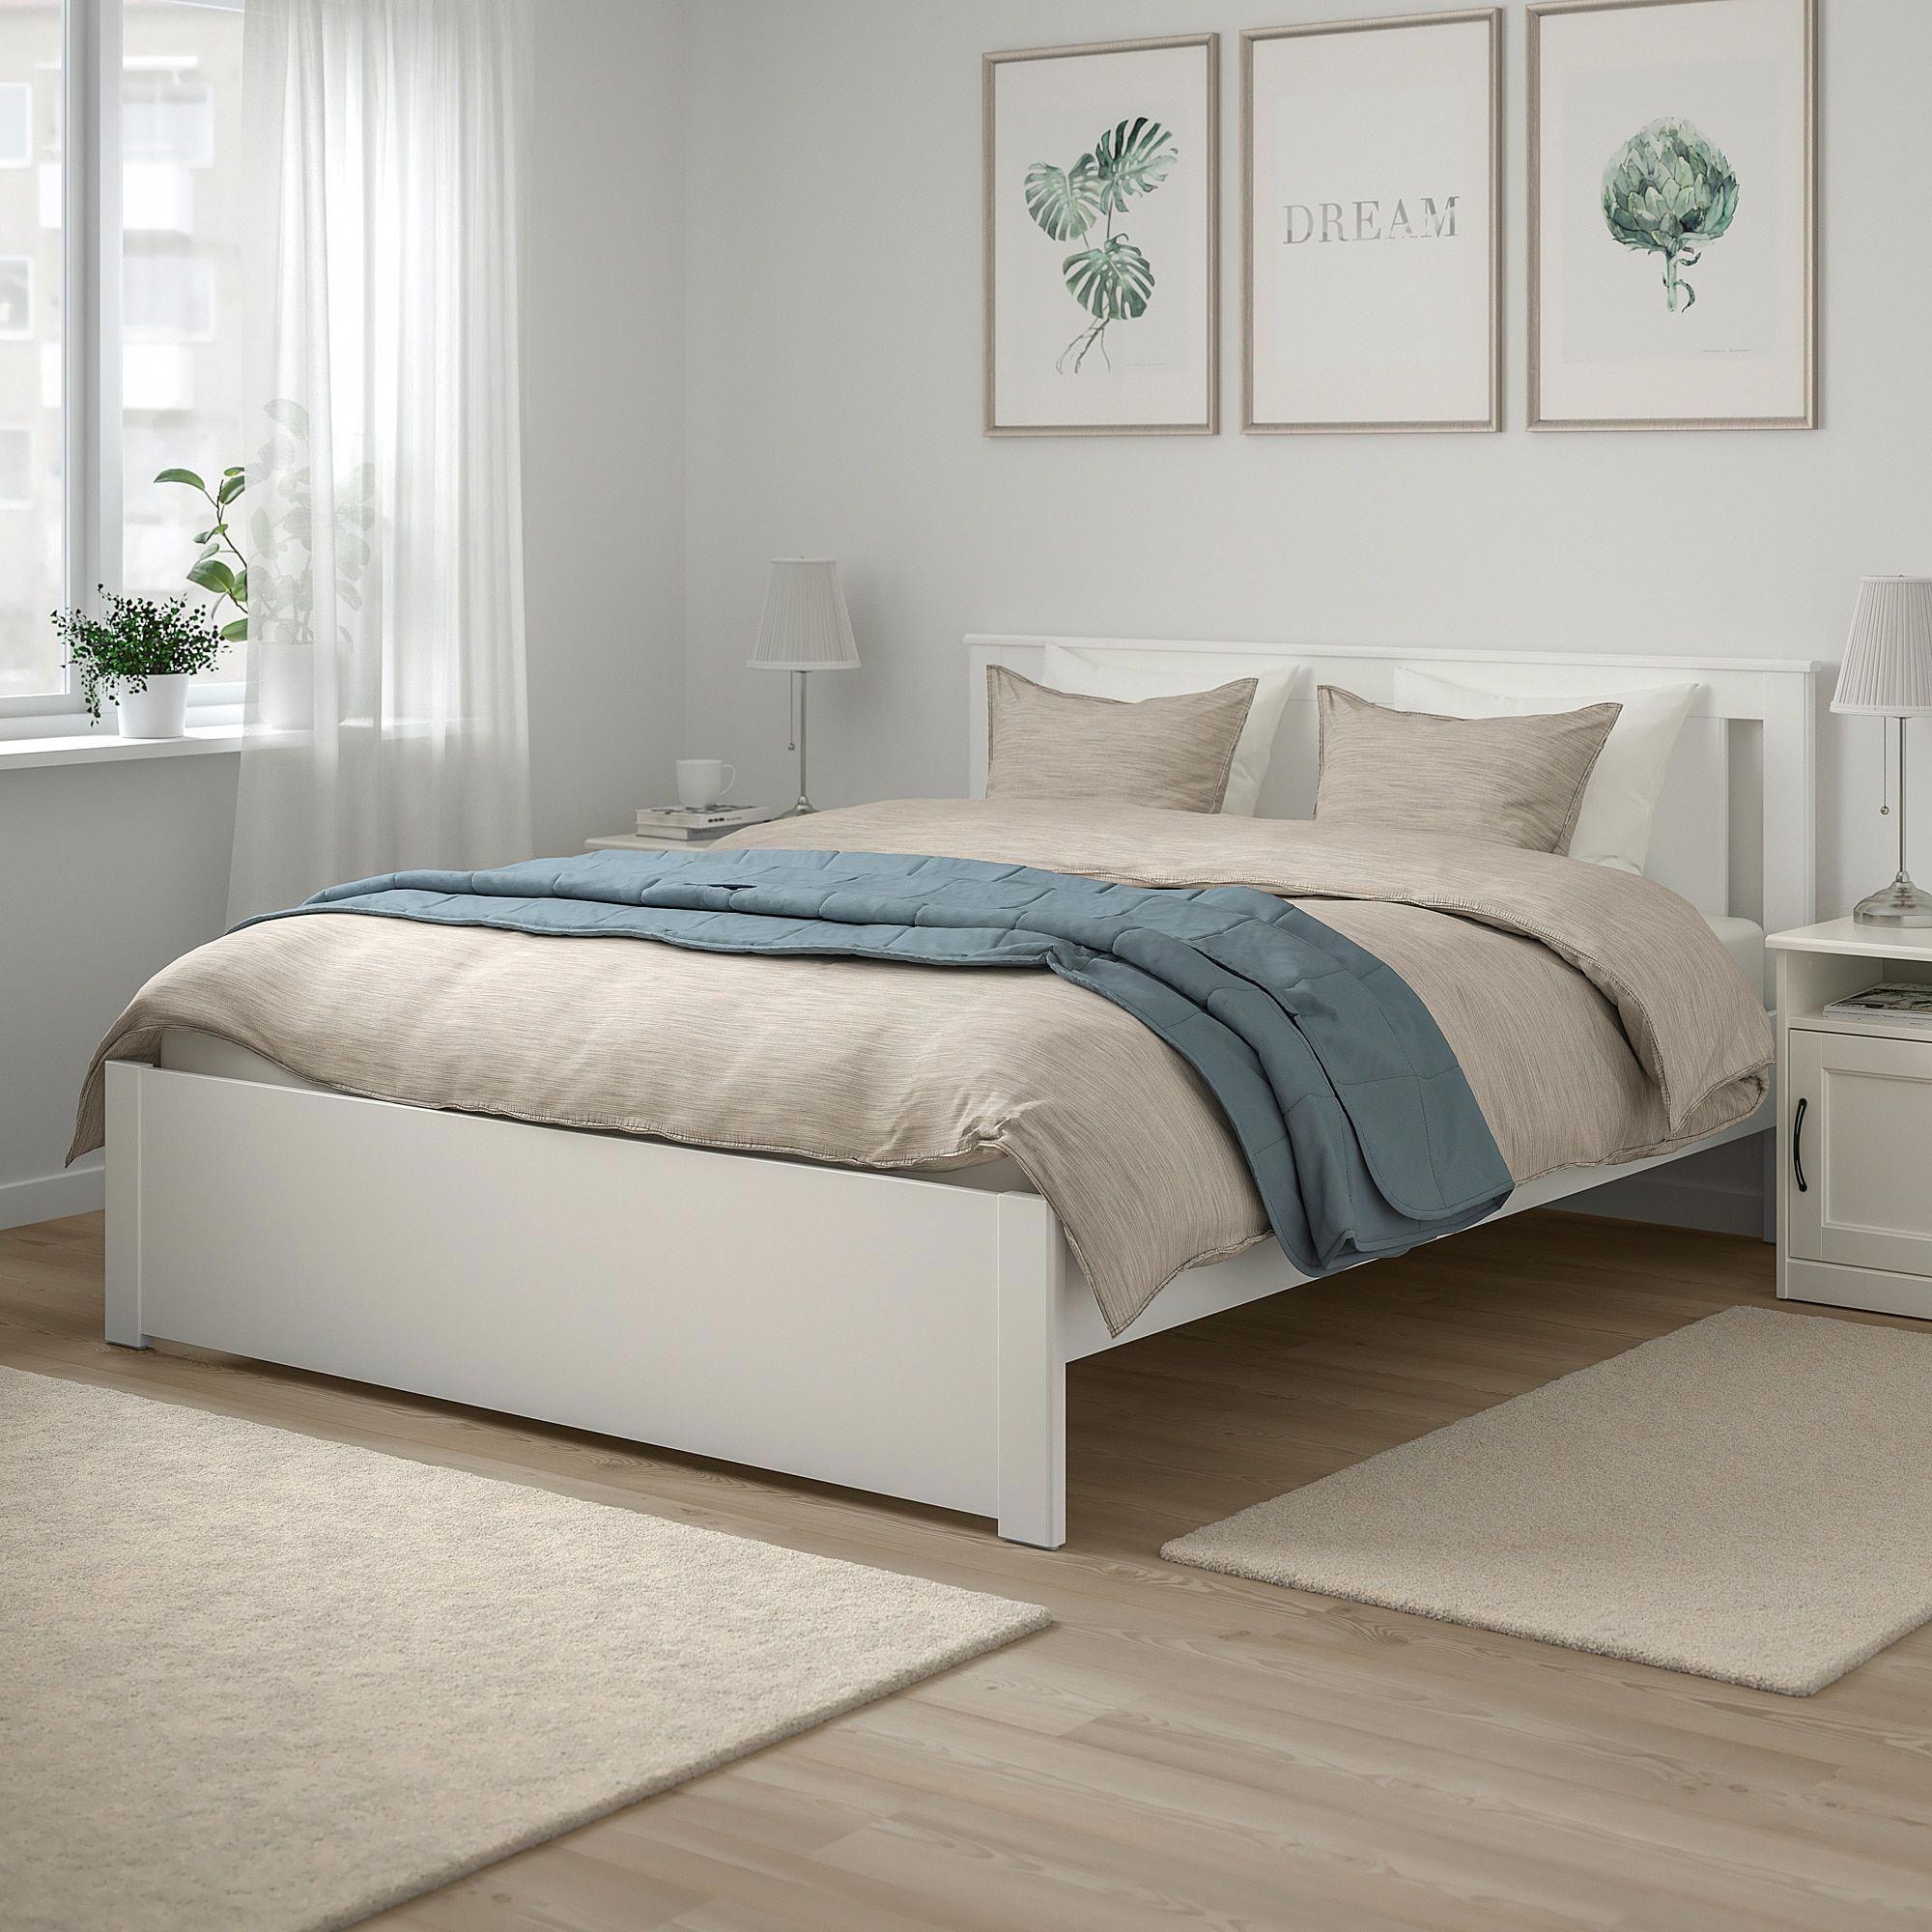 IKEA SONGESAND Bed frame white, Lönset whitebedroom